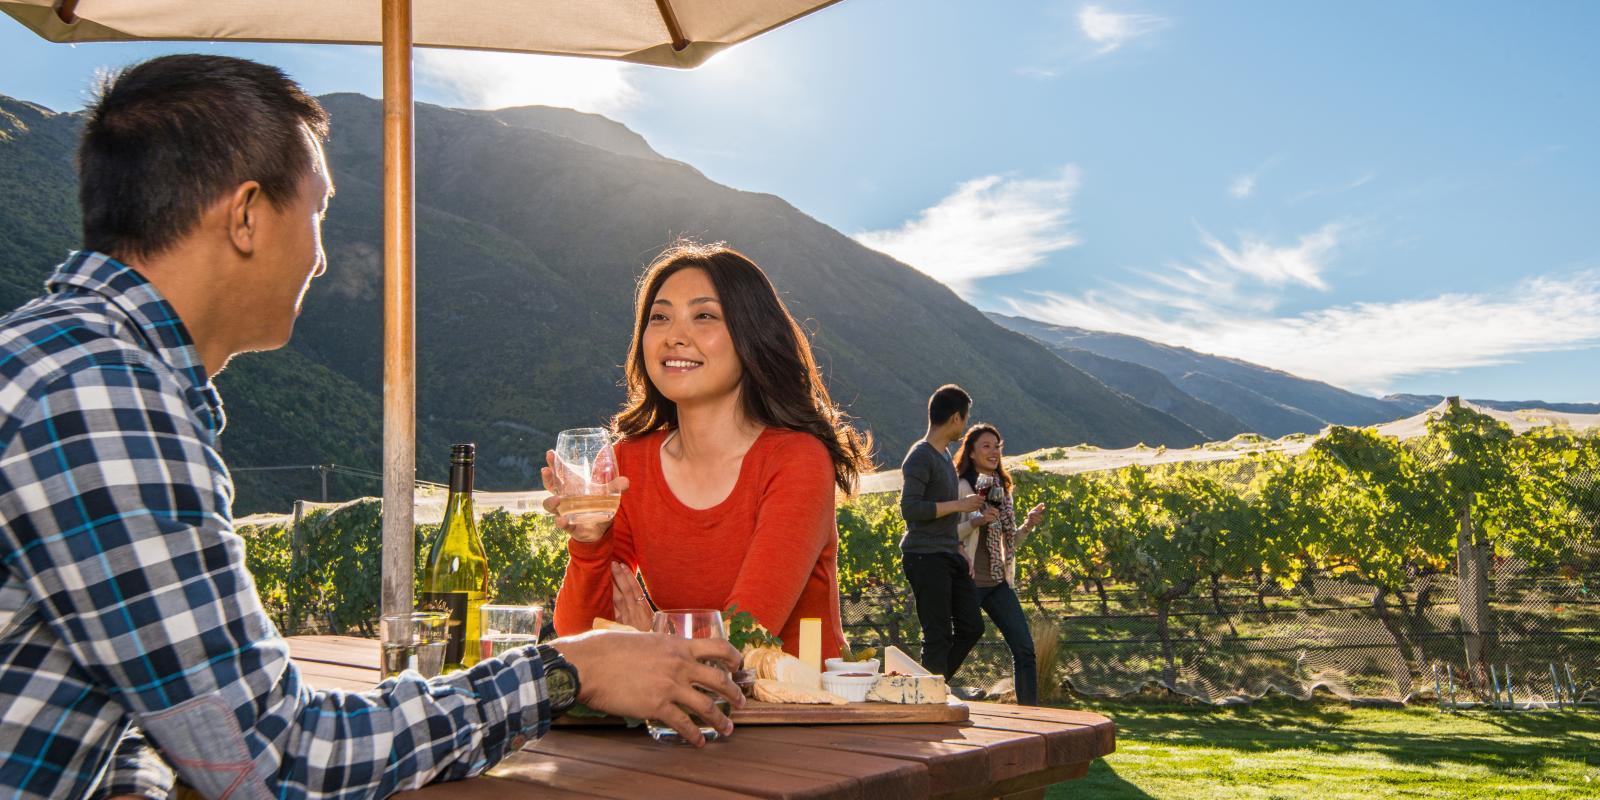 Wine tasting by vineyard in Gibbston Valley